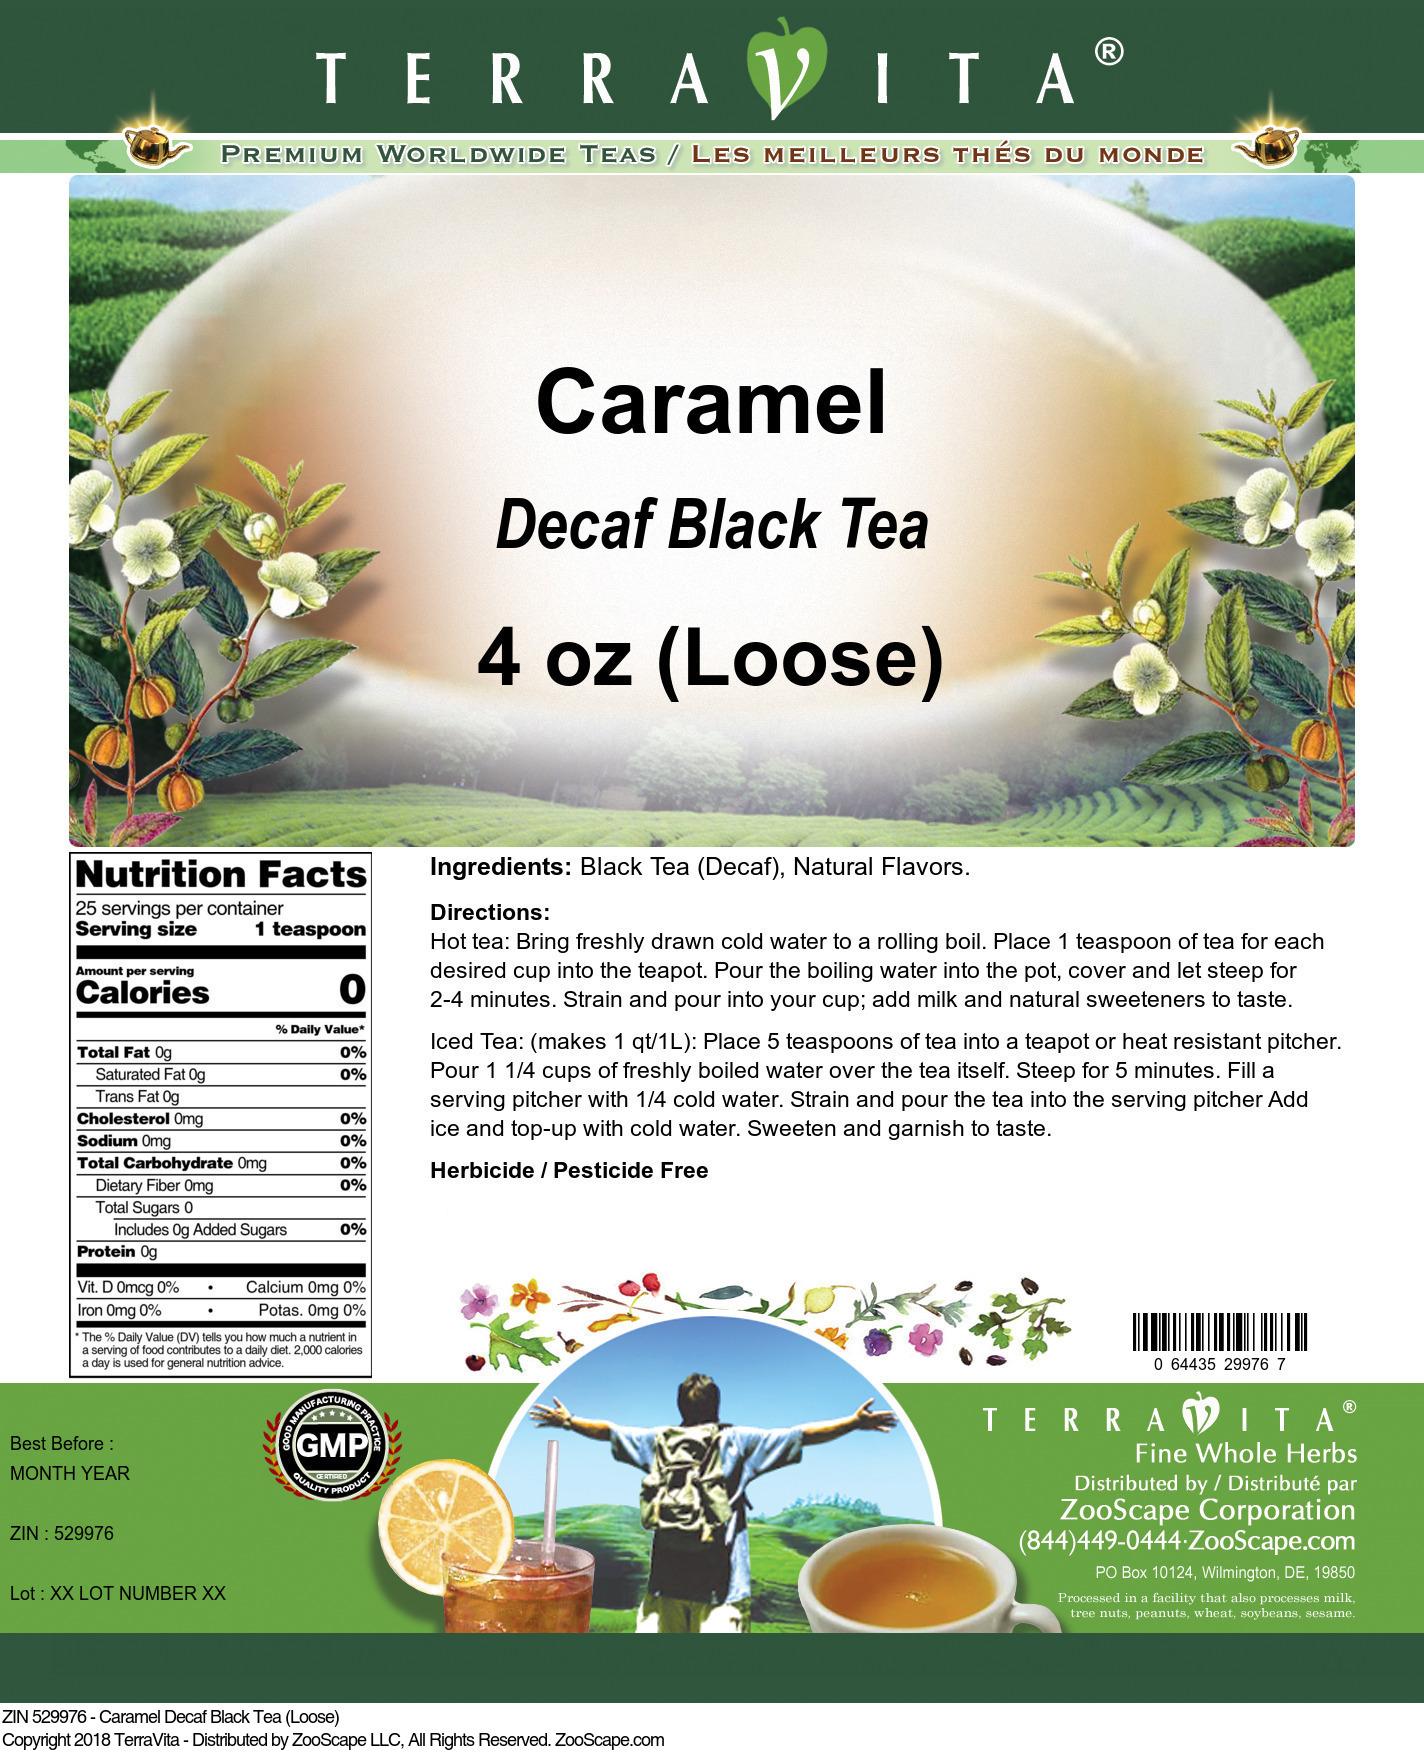 Caramel Decaf Black Tea (Loose)